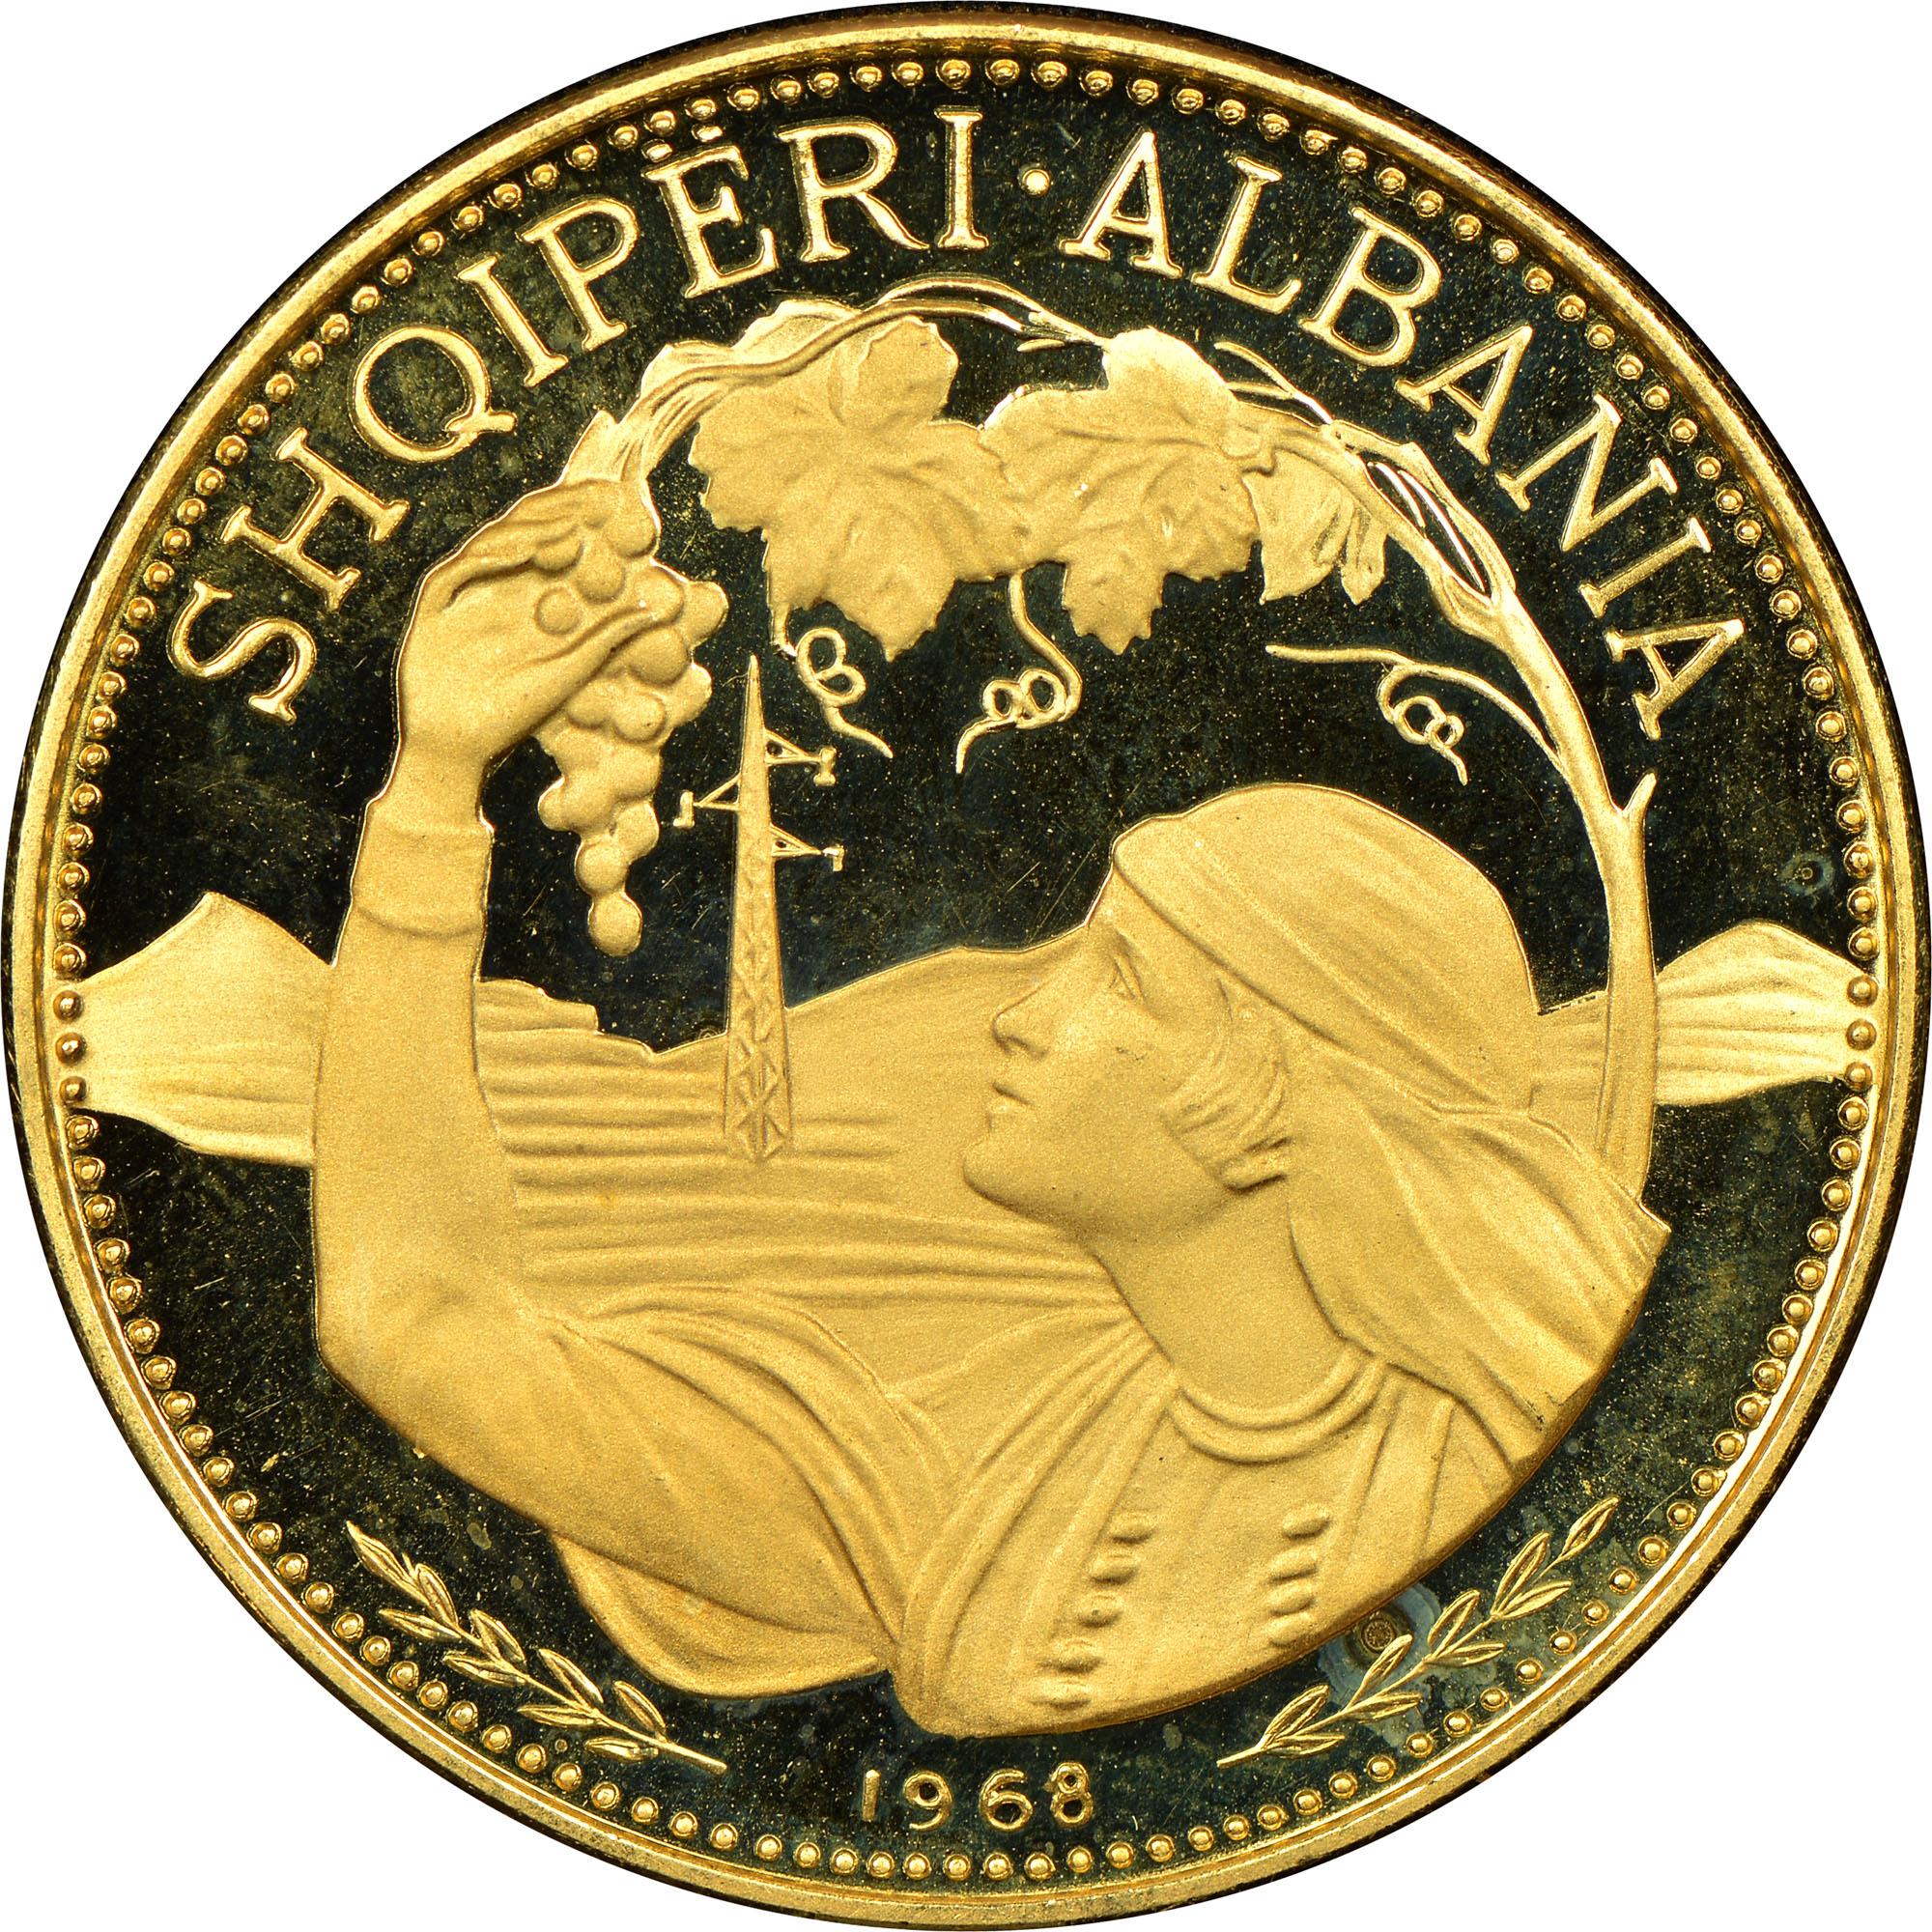 1968 Albania 100 Leke obverse